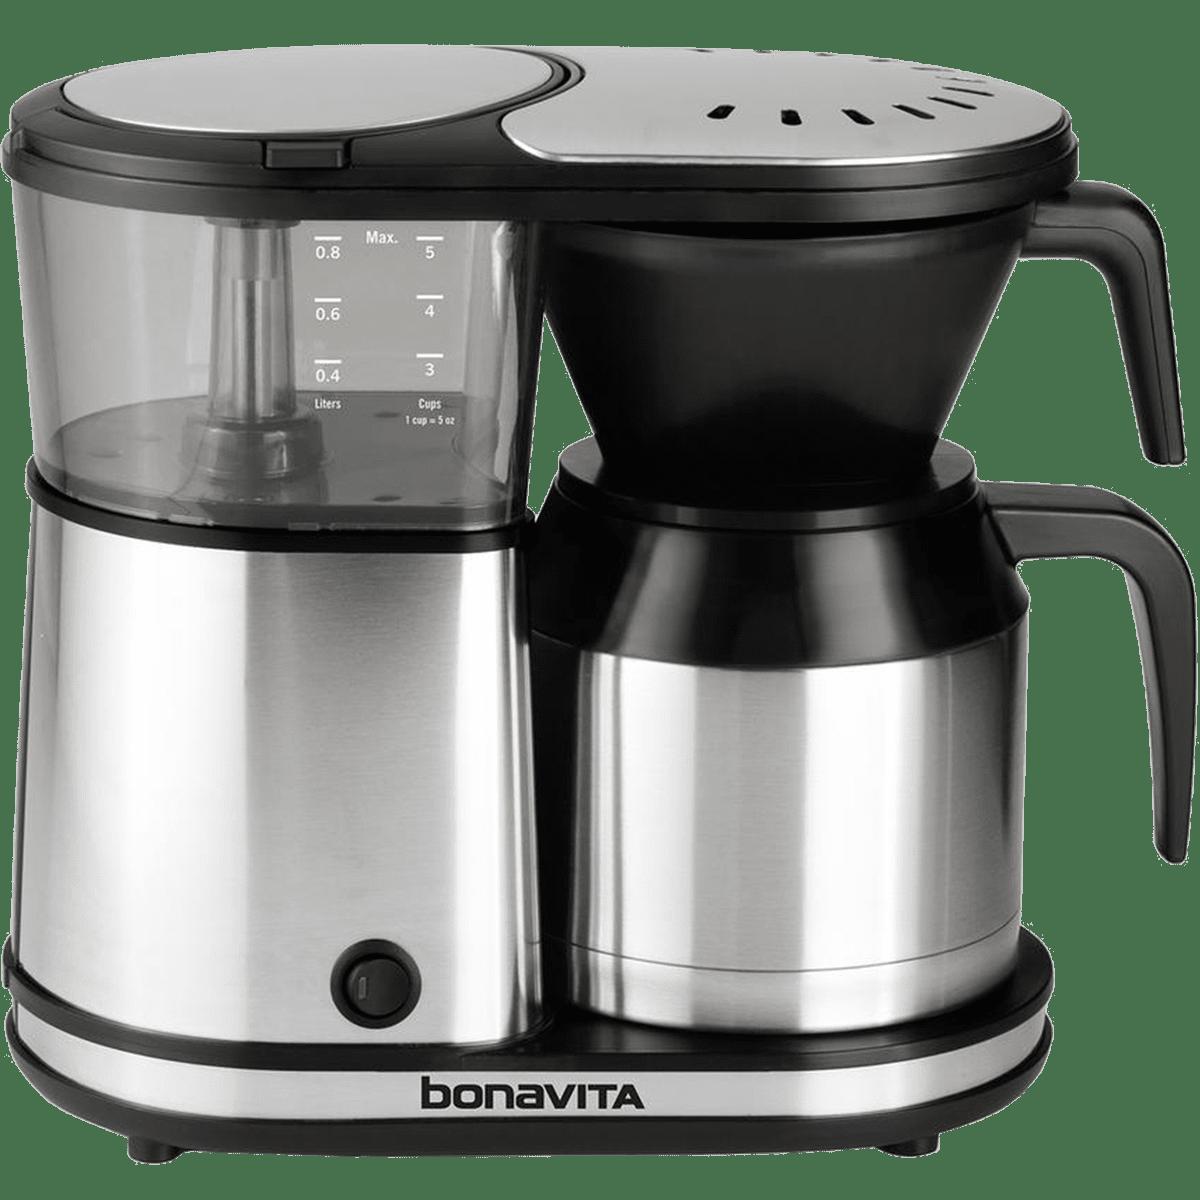 Bonavita 5-Cup Coffee Maker (BV1500TS) Quench Essentials